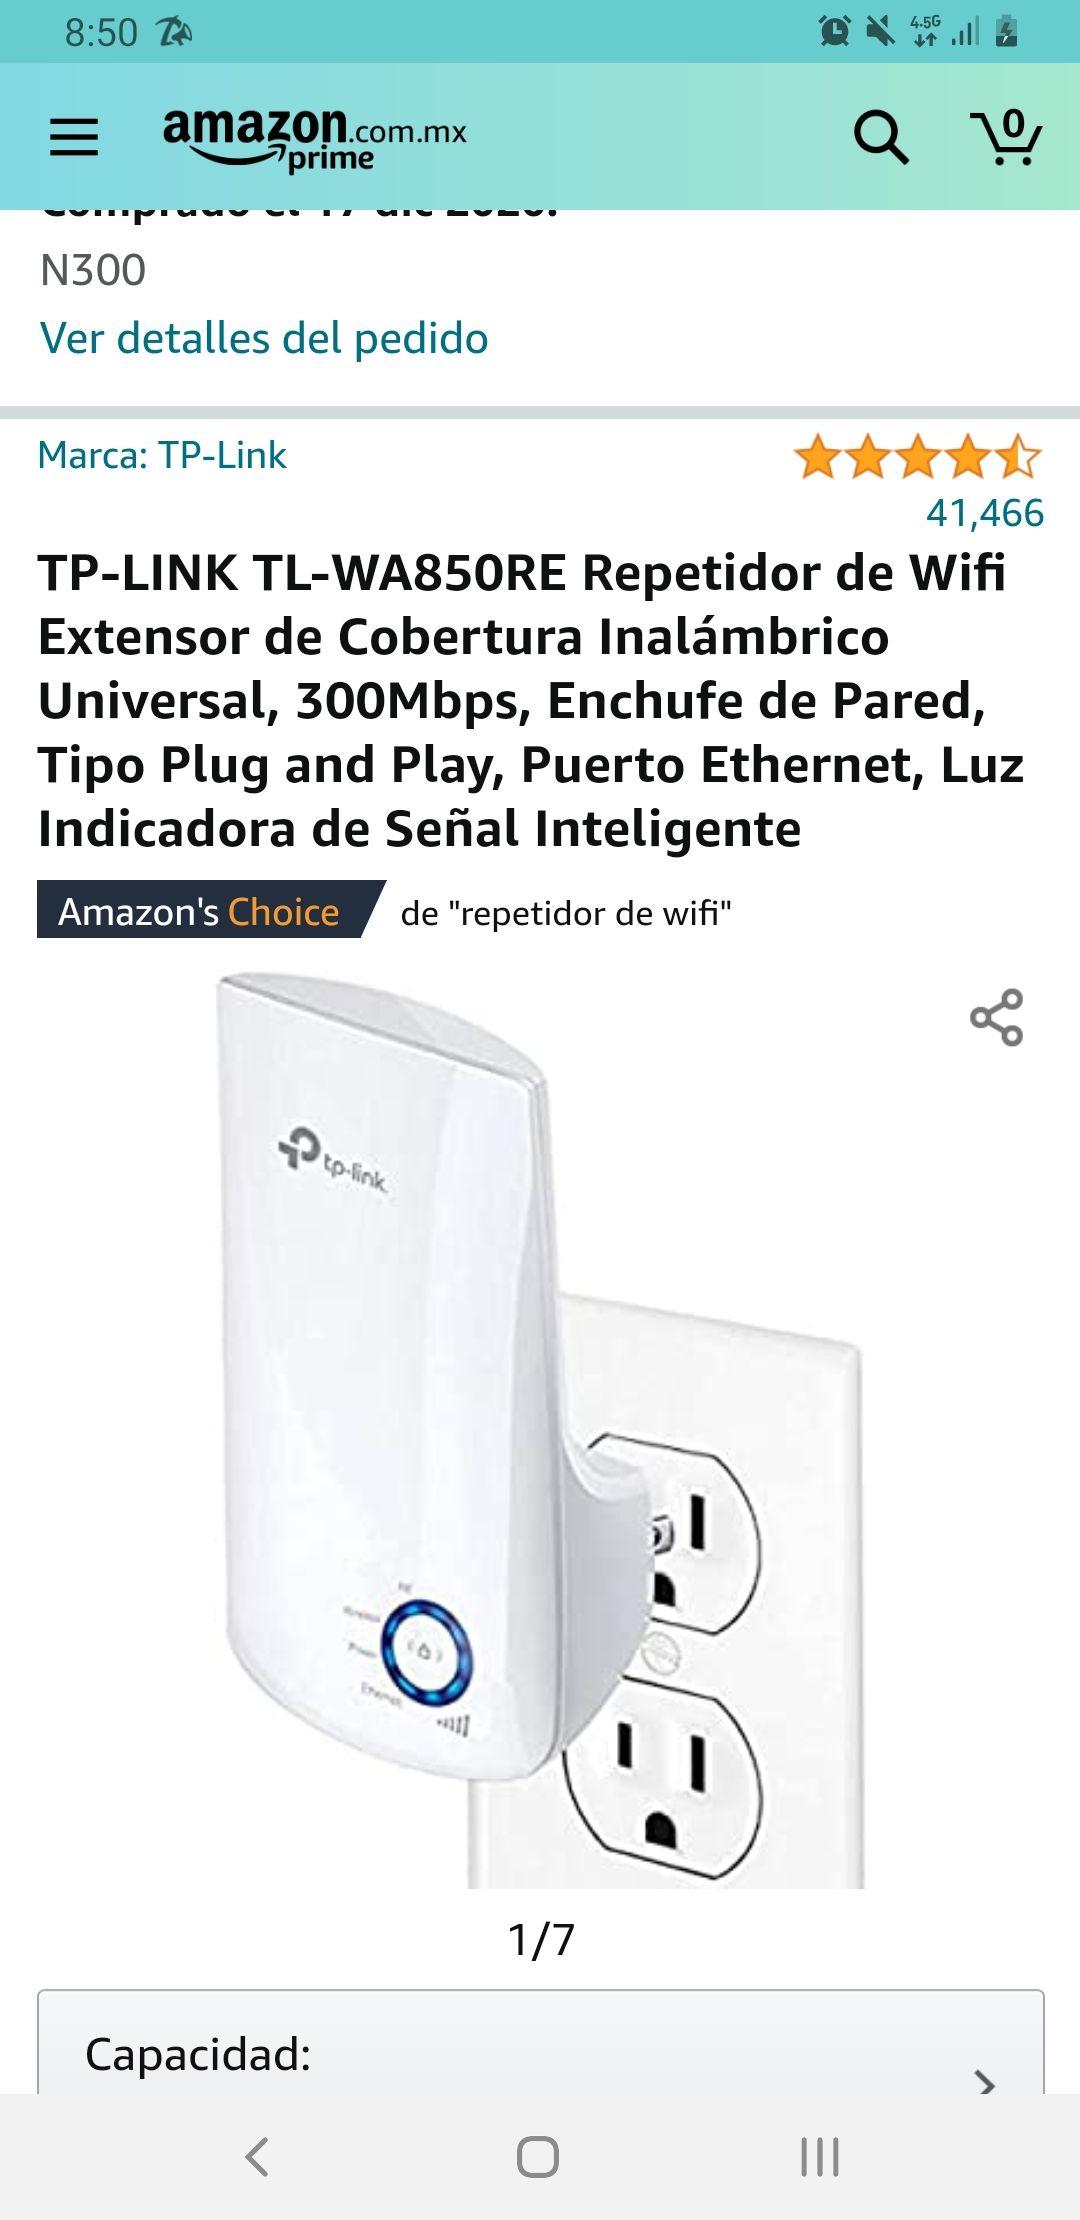 Amazon: TP-LINK TL-WA850RE Repetidor de Wifi Extensor de Cobertura Inalámbrico